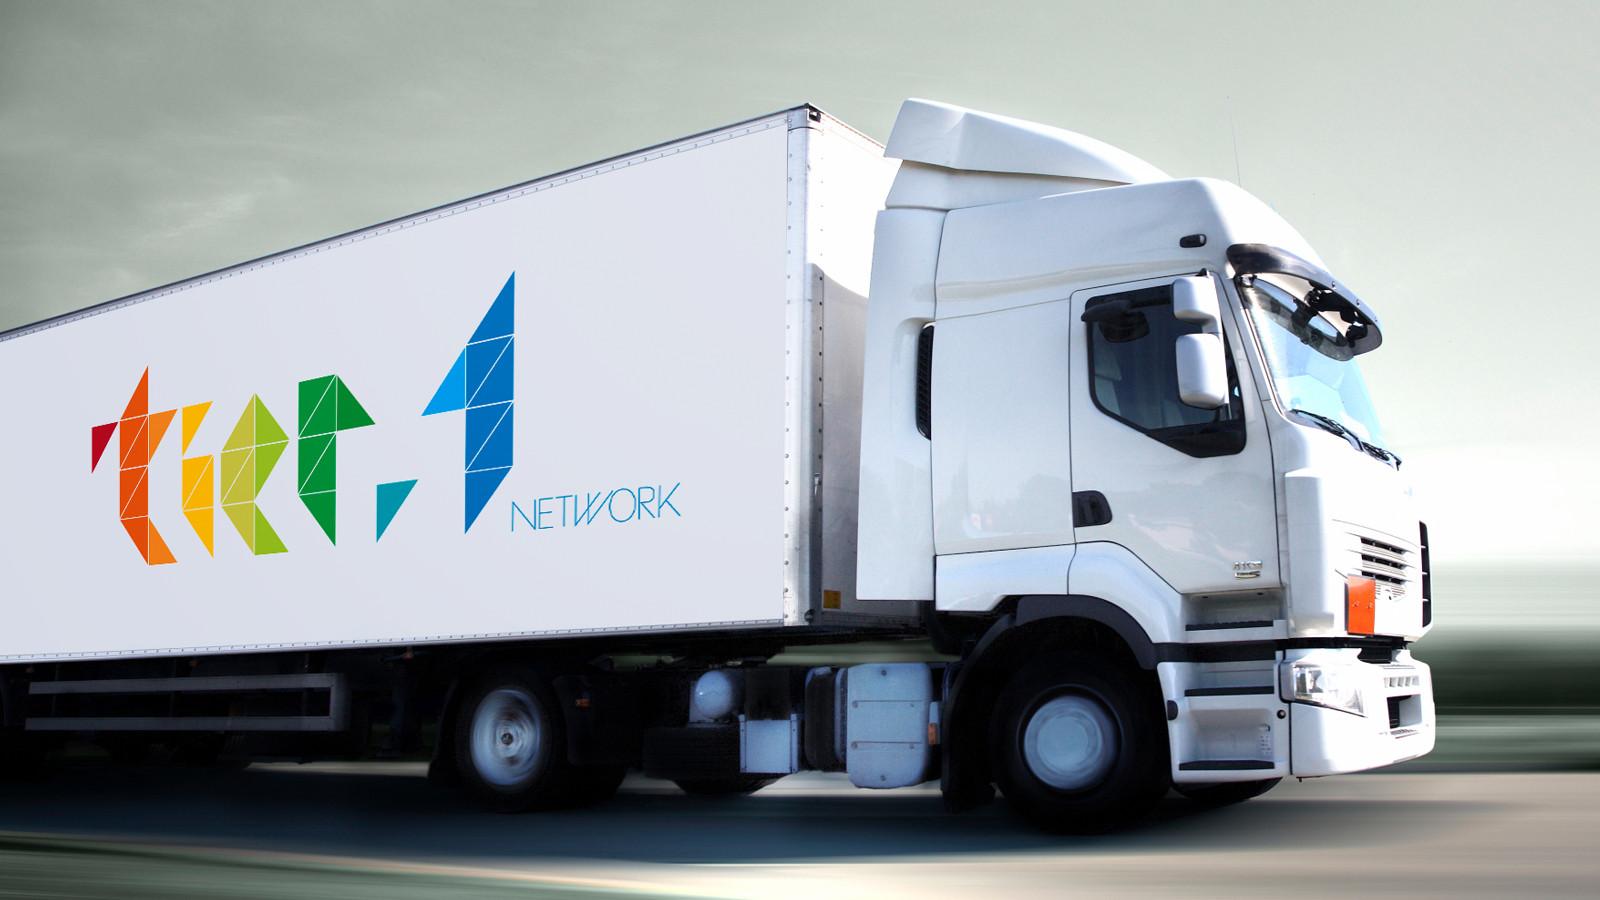 Tier 1 Truck_16x9_5.jpg